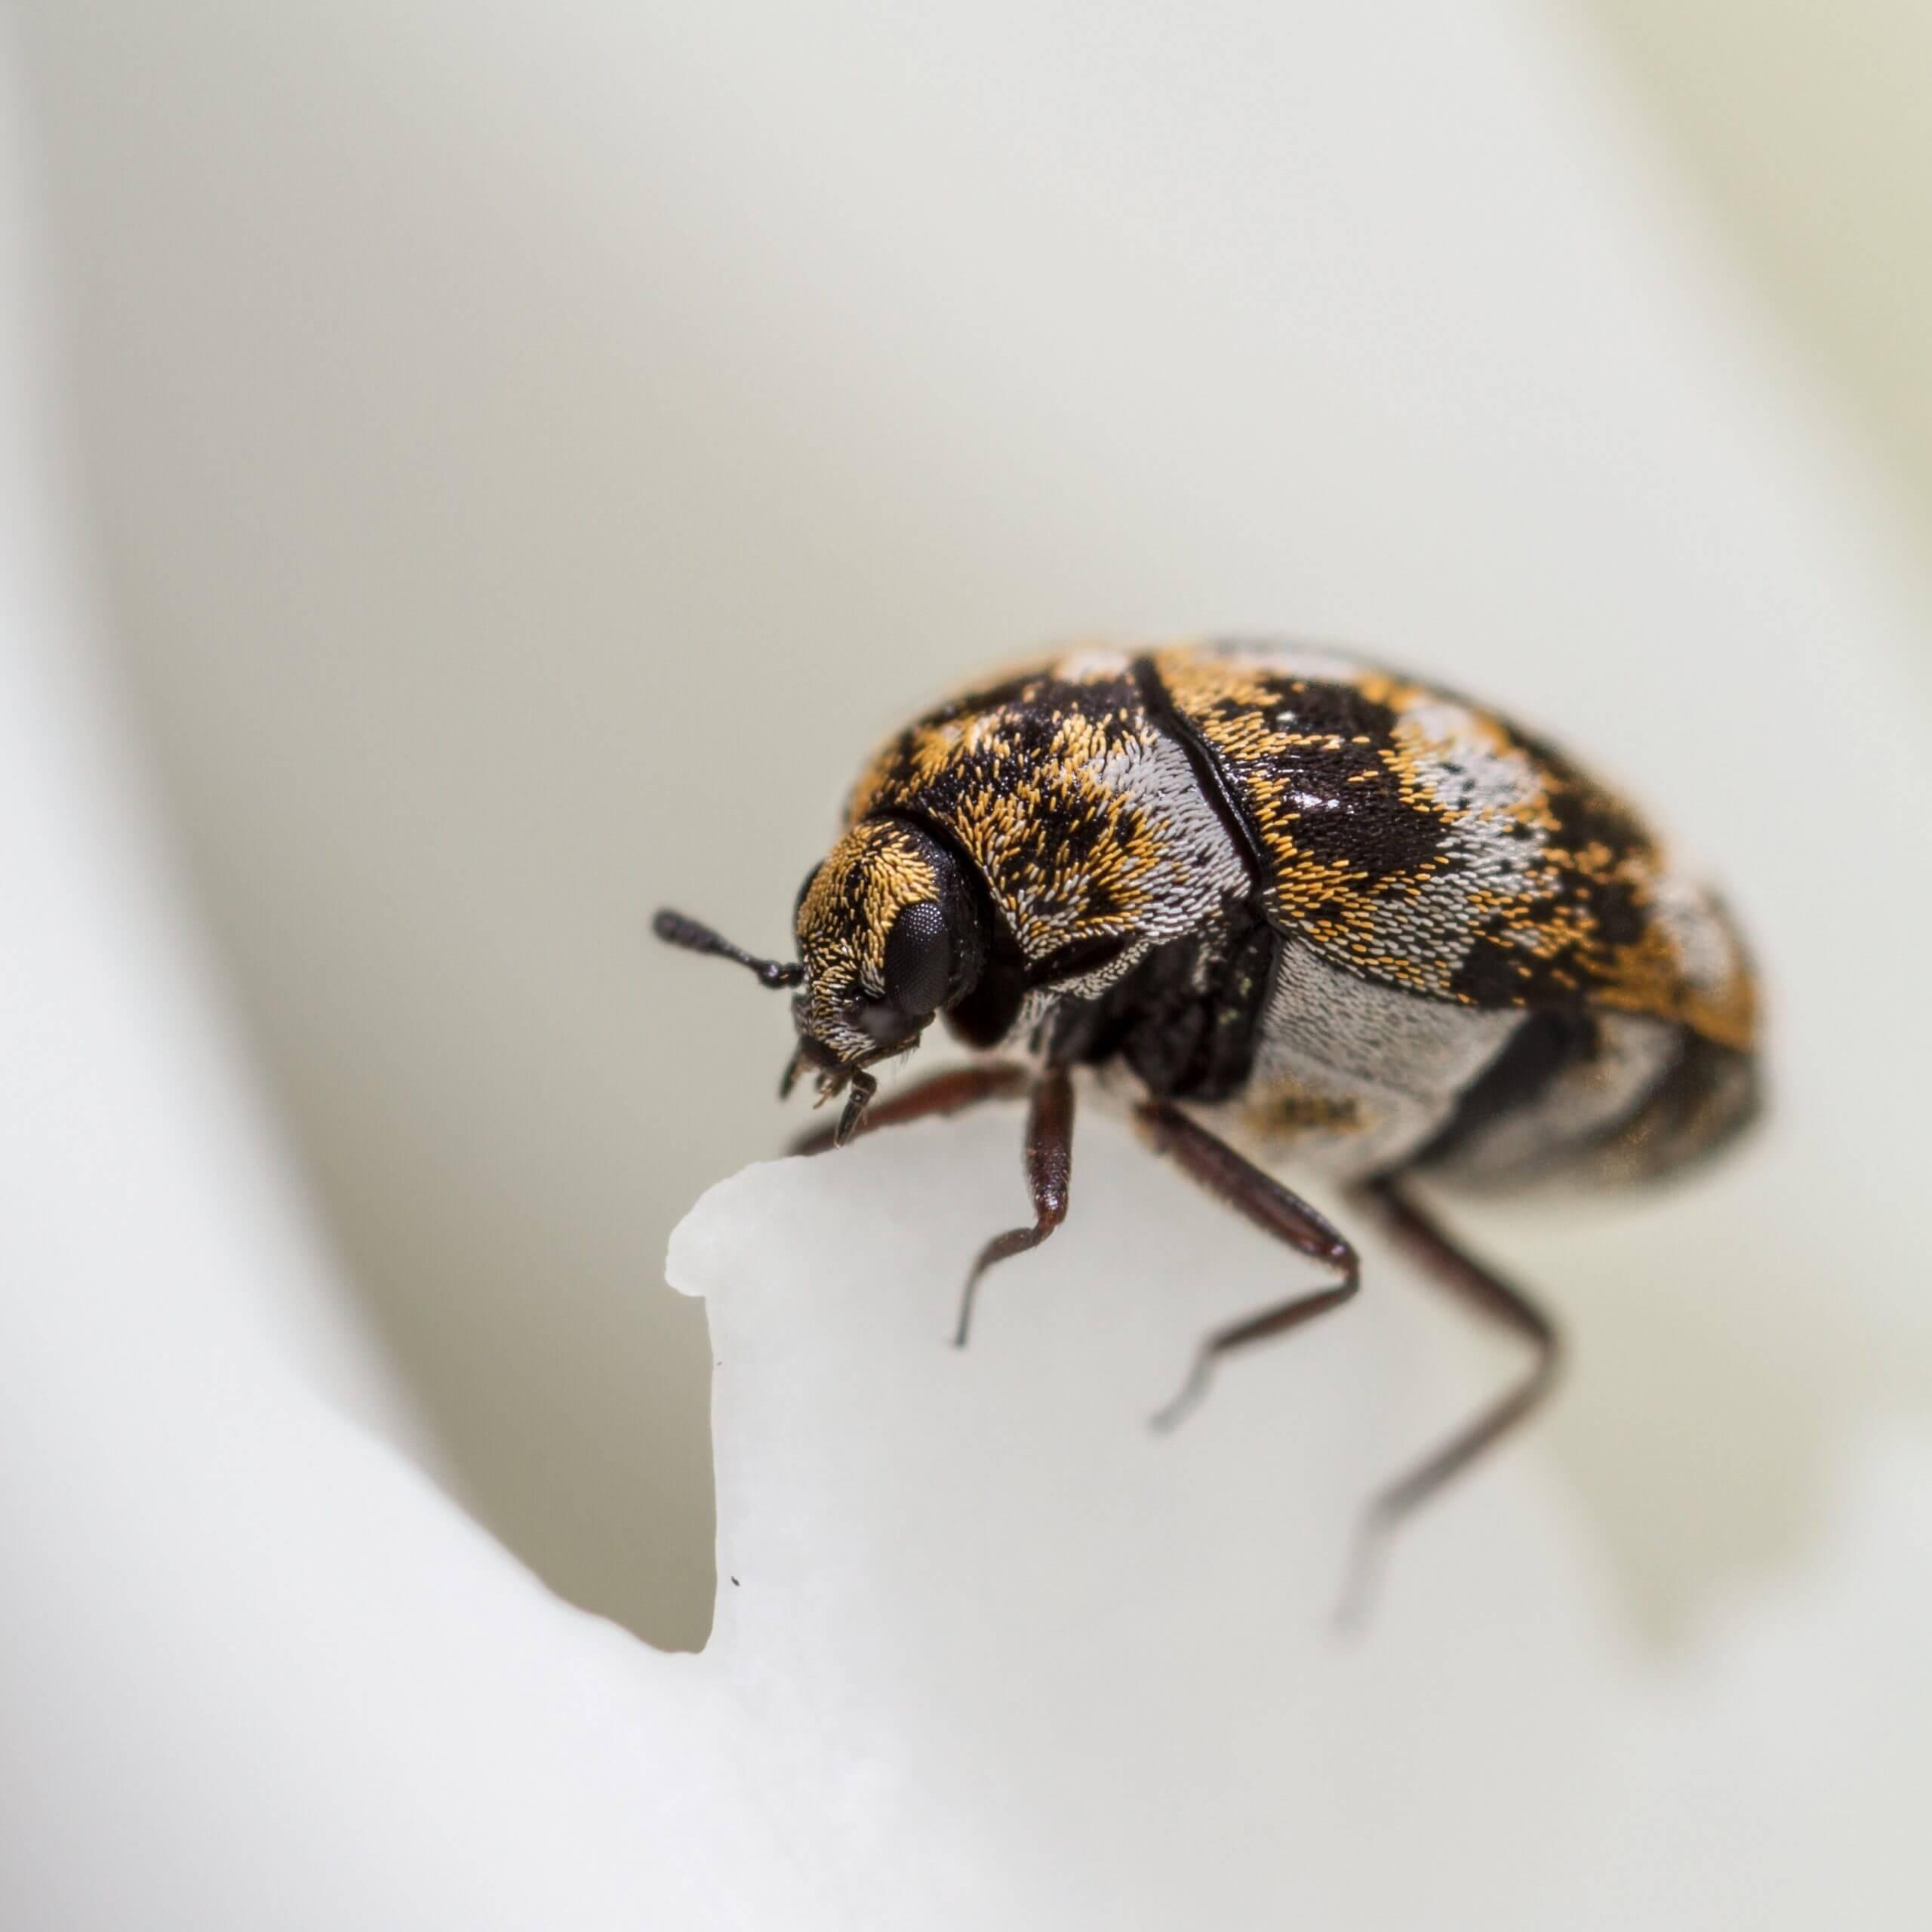 pest-guide-carpet-beetle-1 Owl pest control Ireland